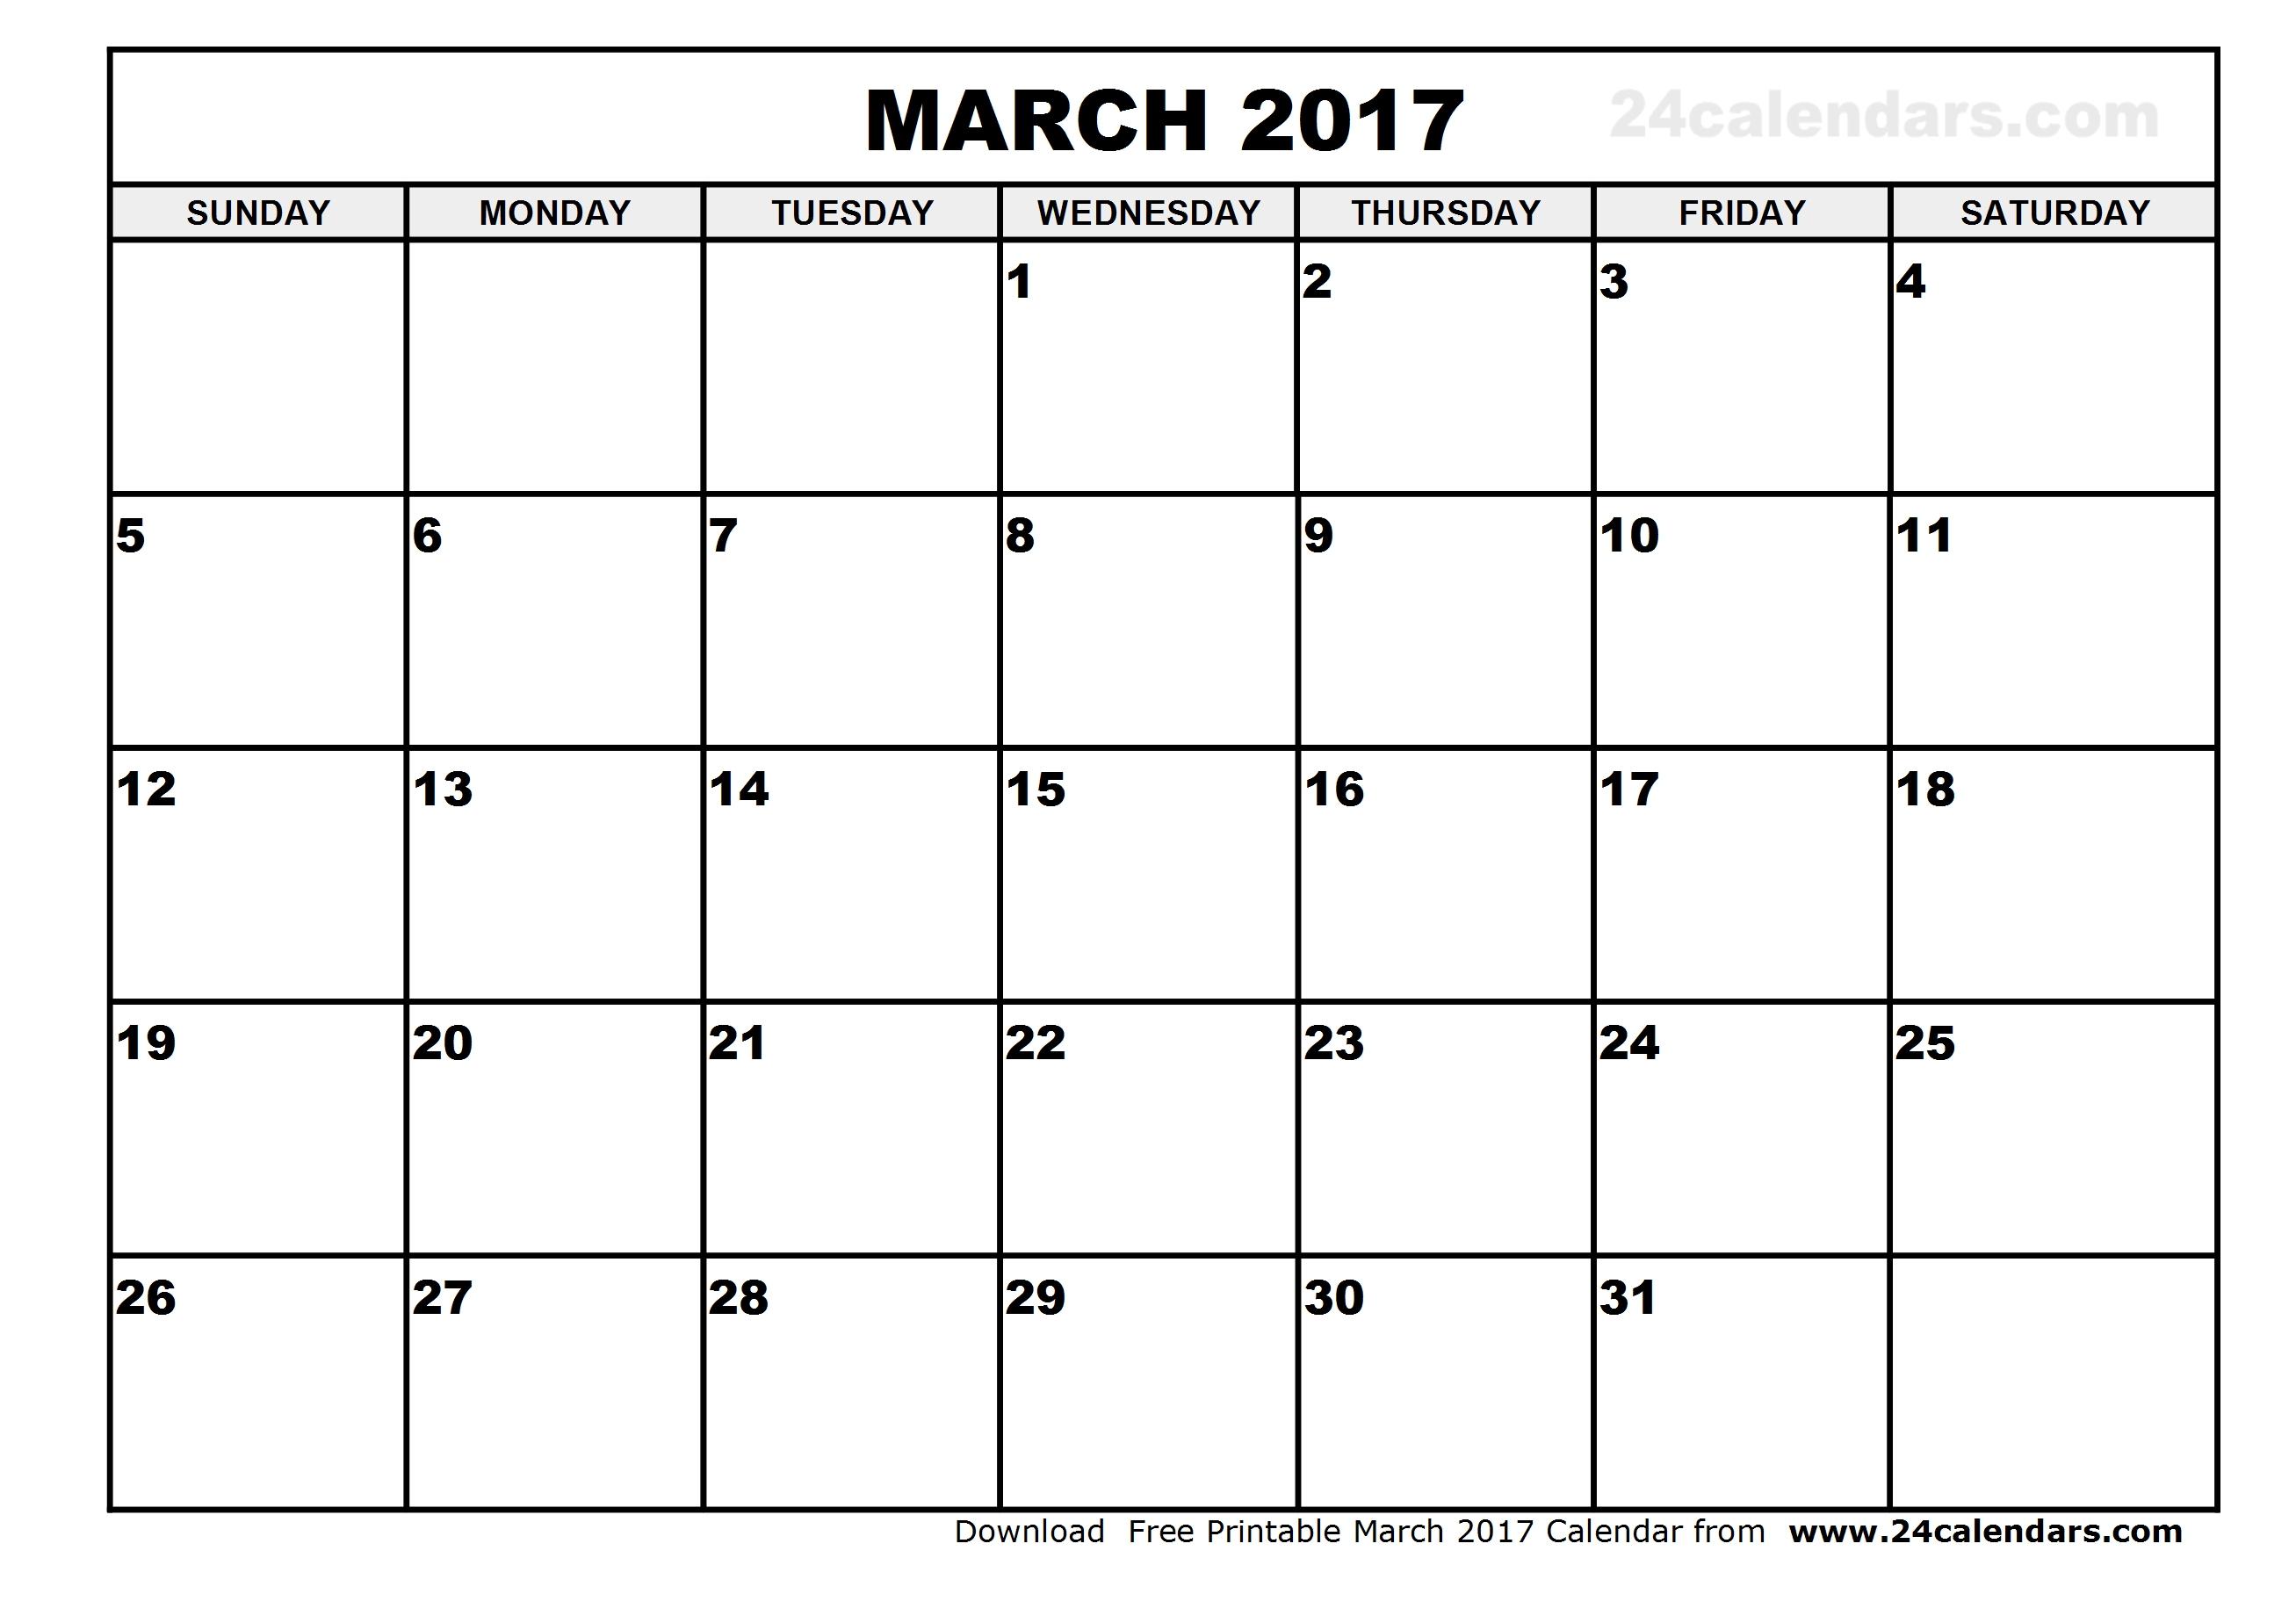 Free-Blank-Printable-March-2017-Calendar-Printable in Blank Printable Monthly Calendar